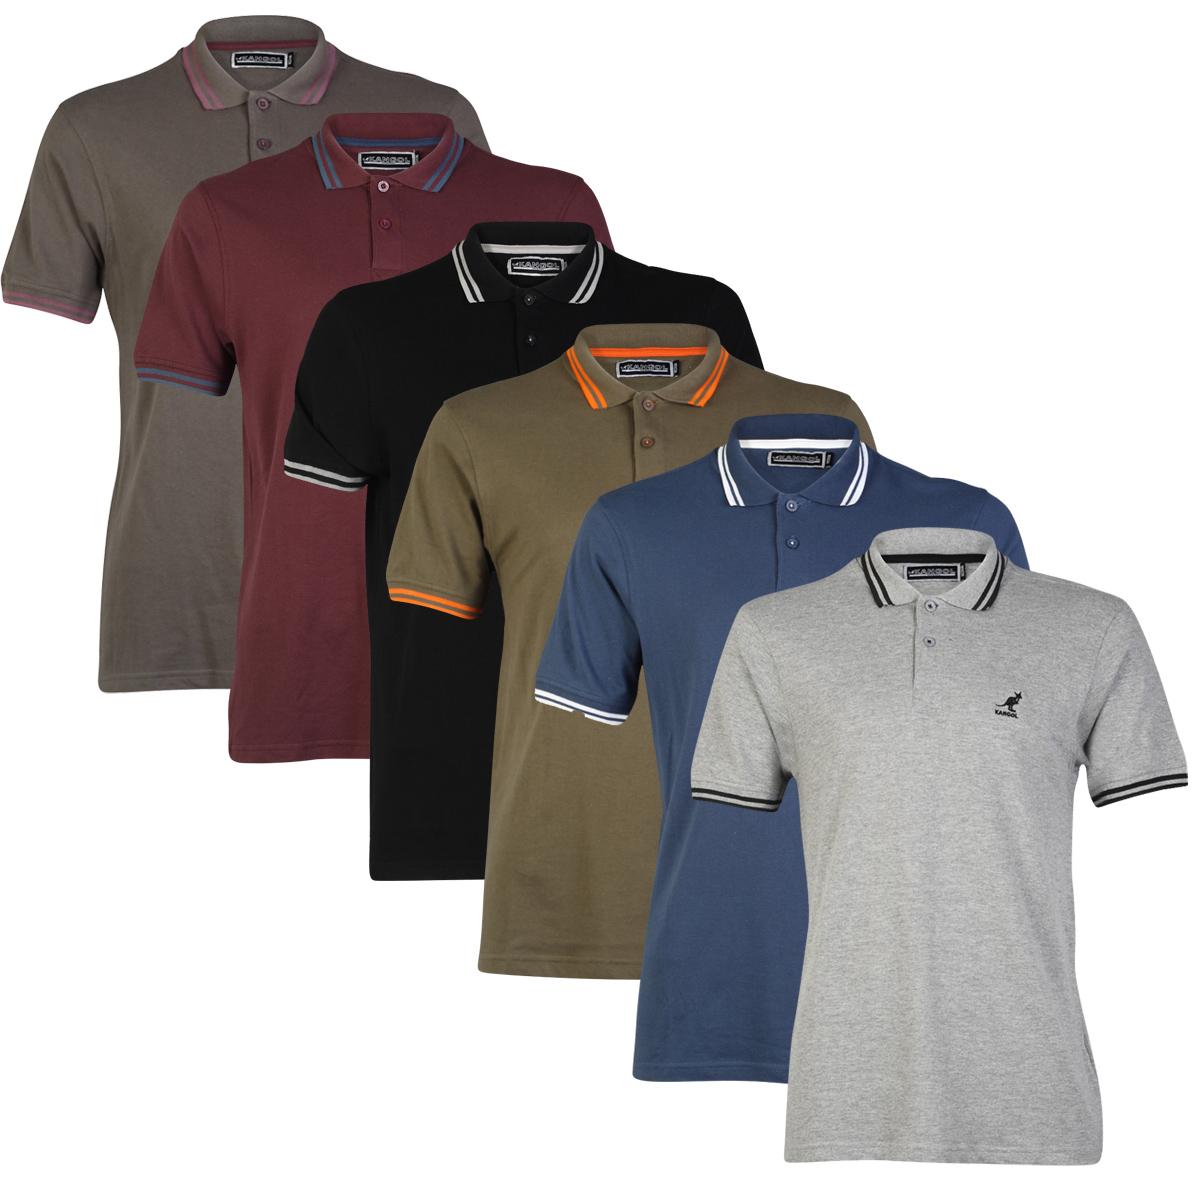 Bb mens kangol striped button polo neck shirt top size s xxl for Xxl mens polo shirts